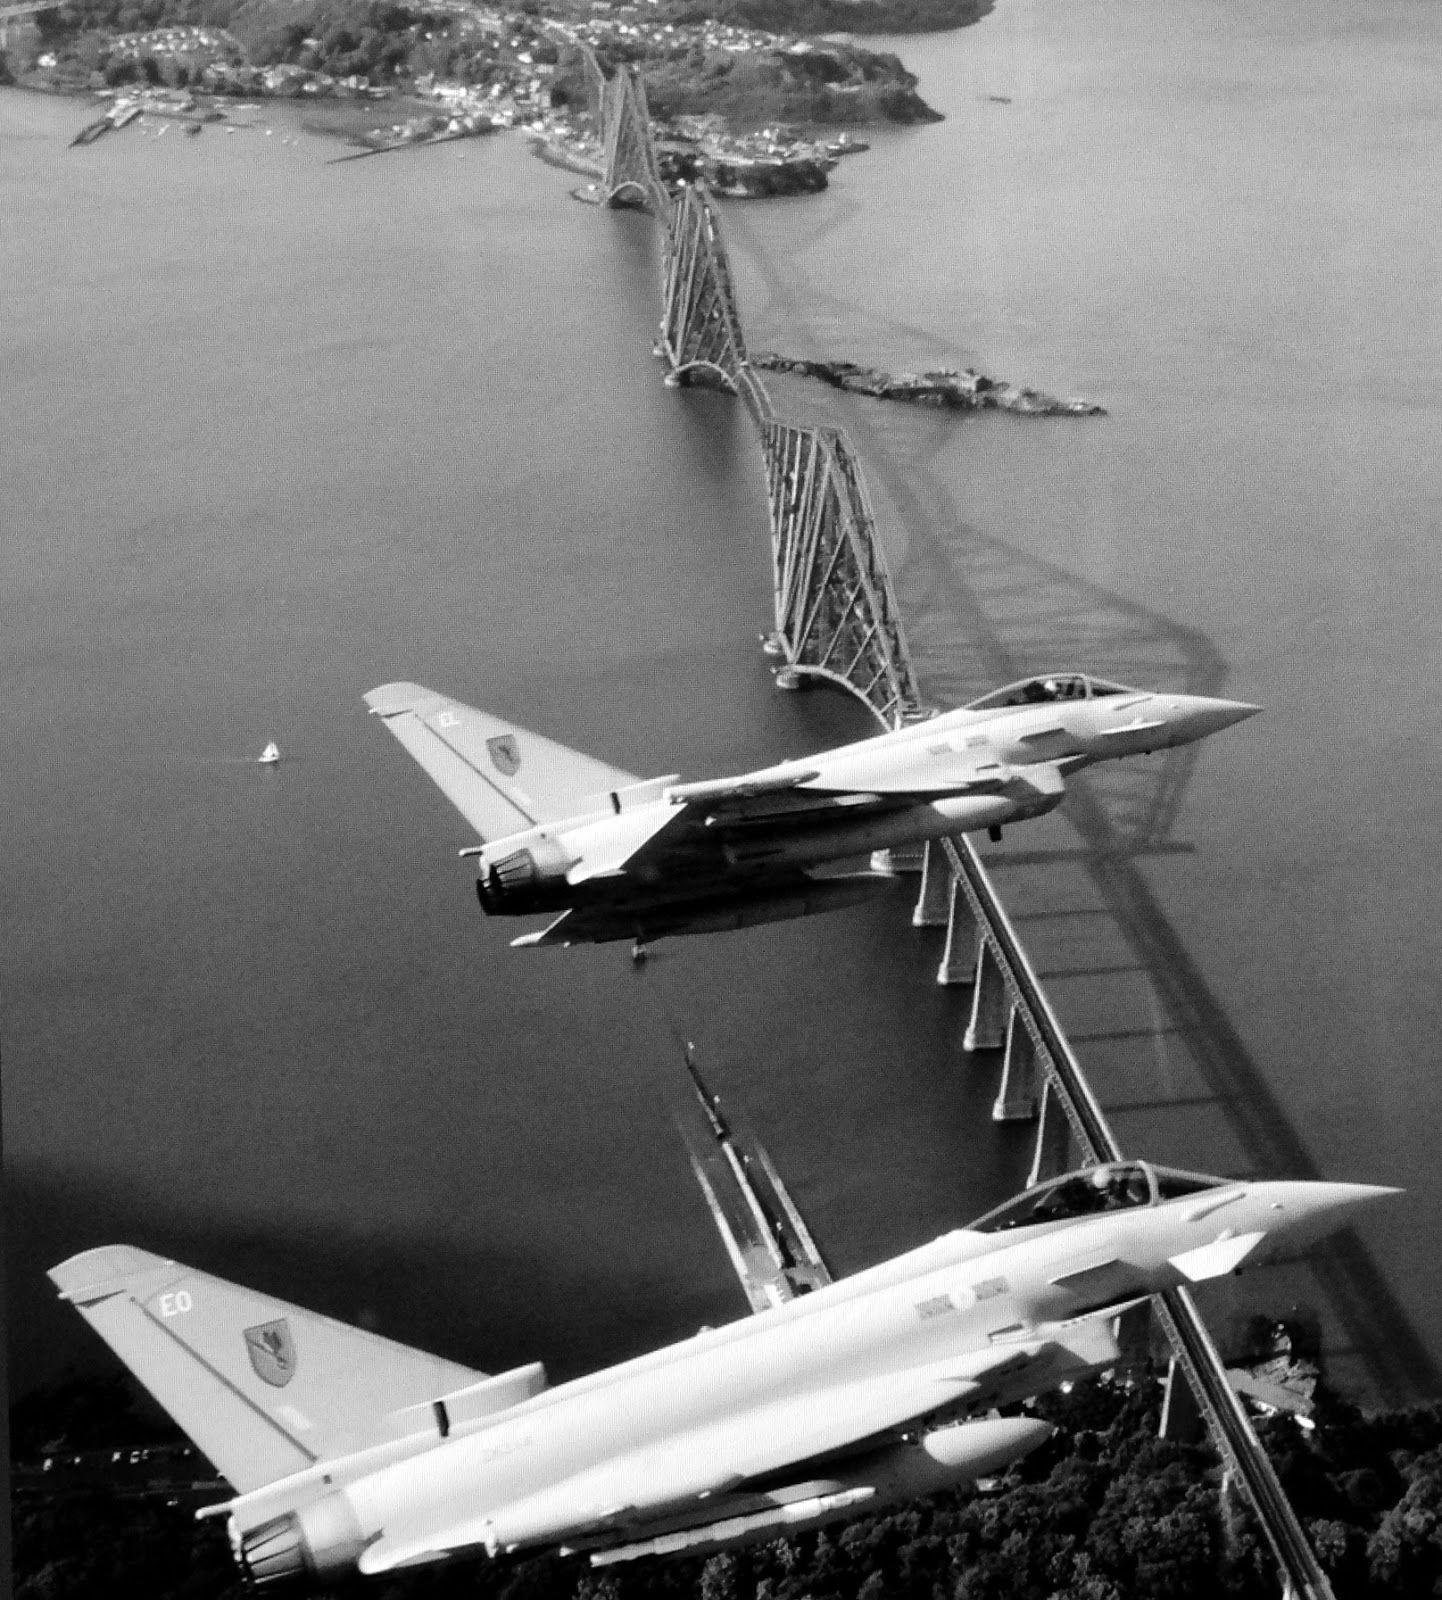 Tour Scotland Photographs: Old Photograph Royal Air Force Jets Forth Railway Bridge Scotland